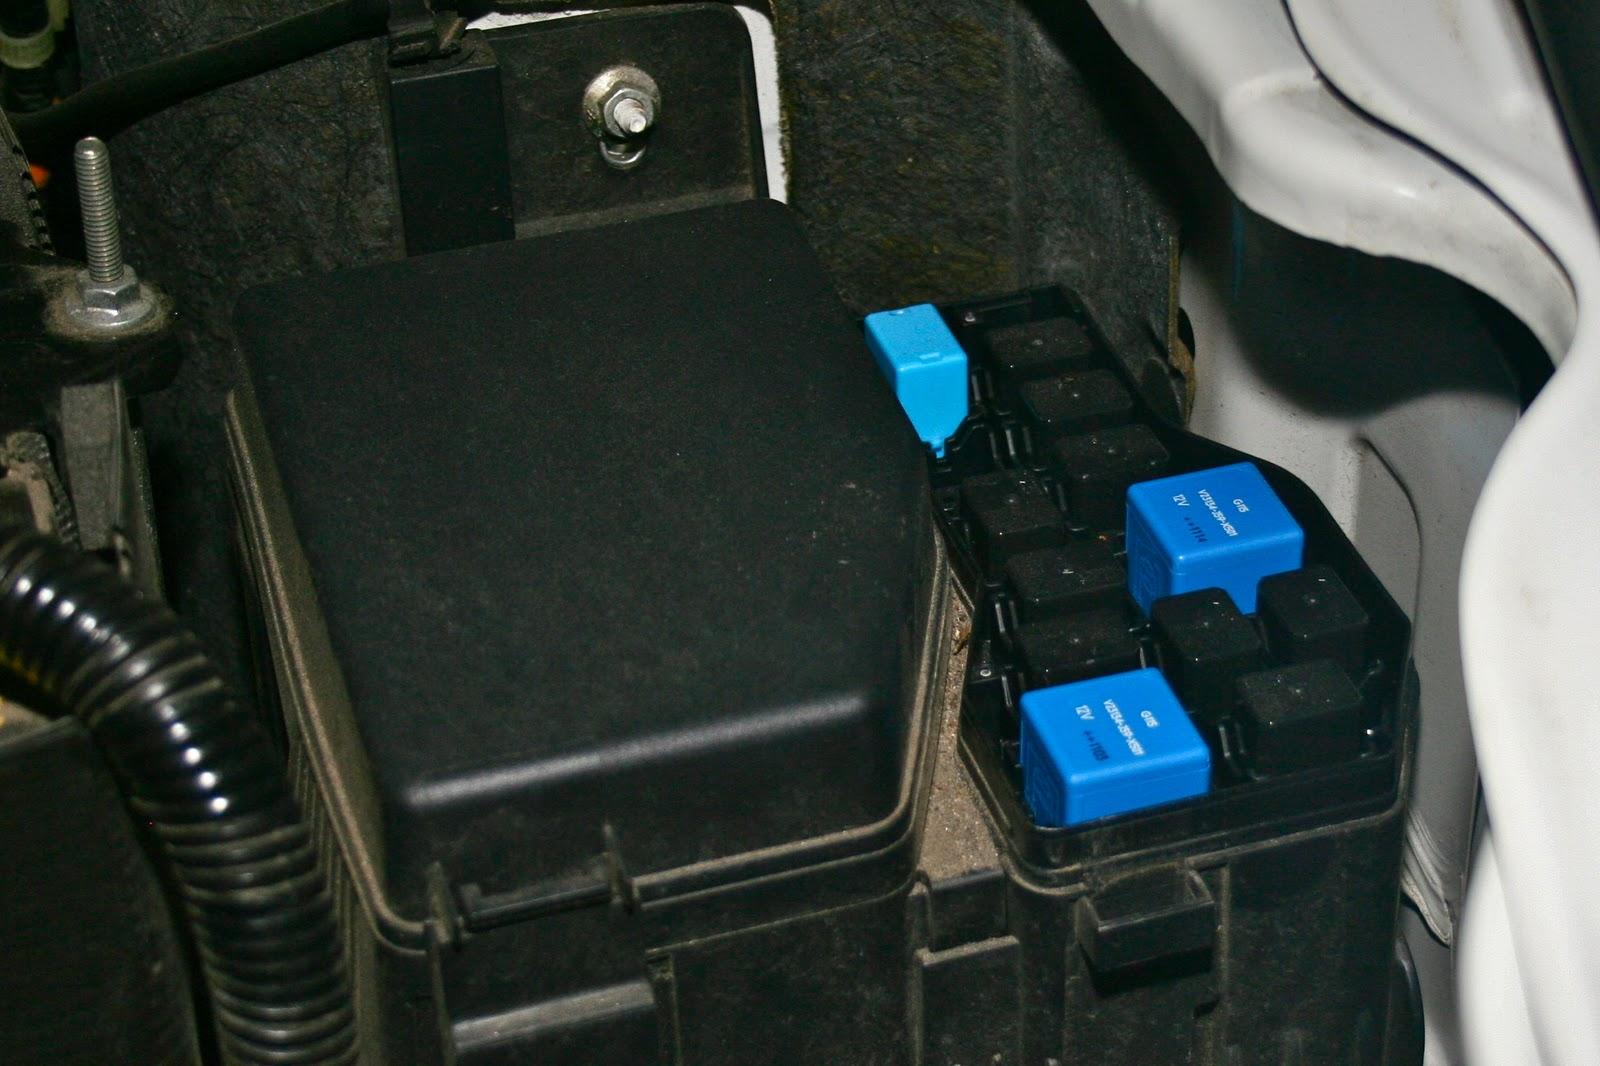 medium resolution of 2007 mazda cx 9 fuse box location